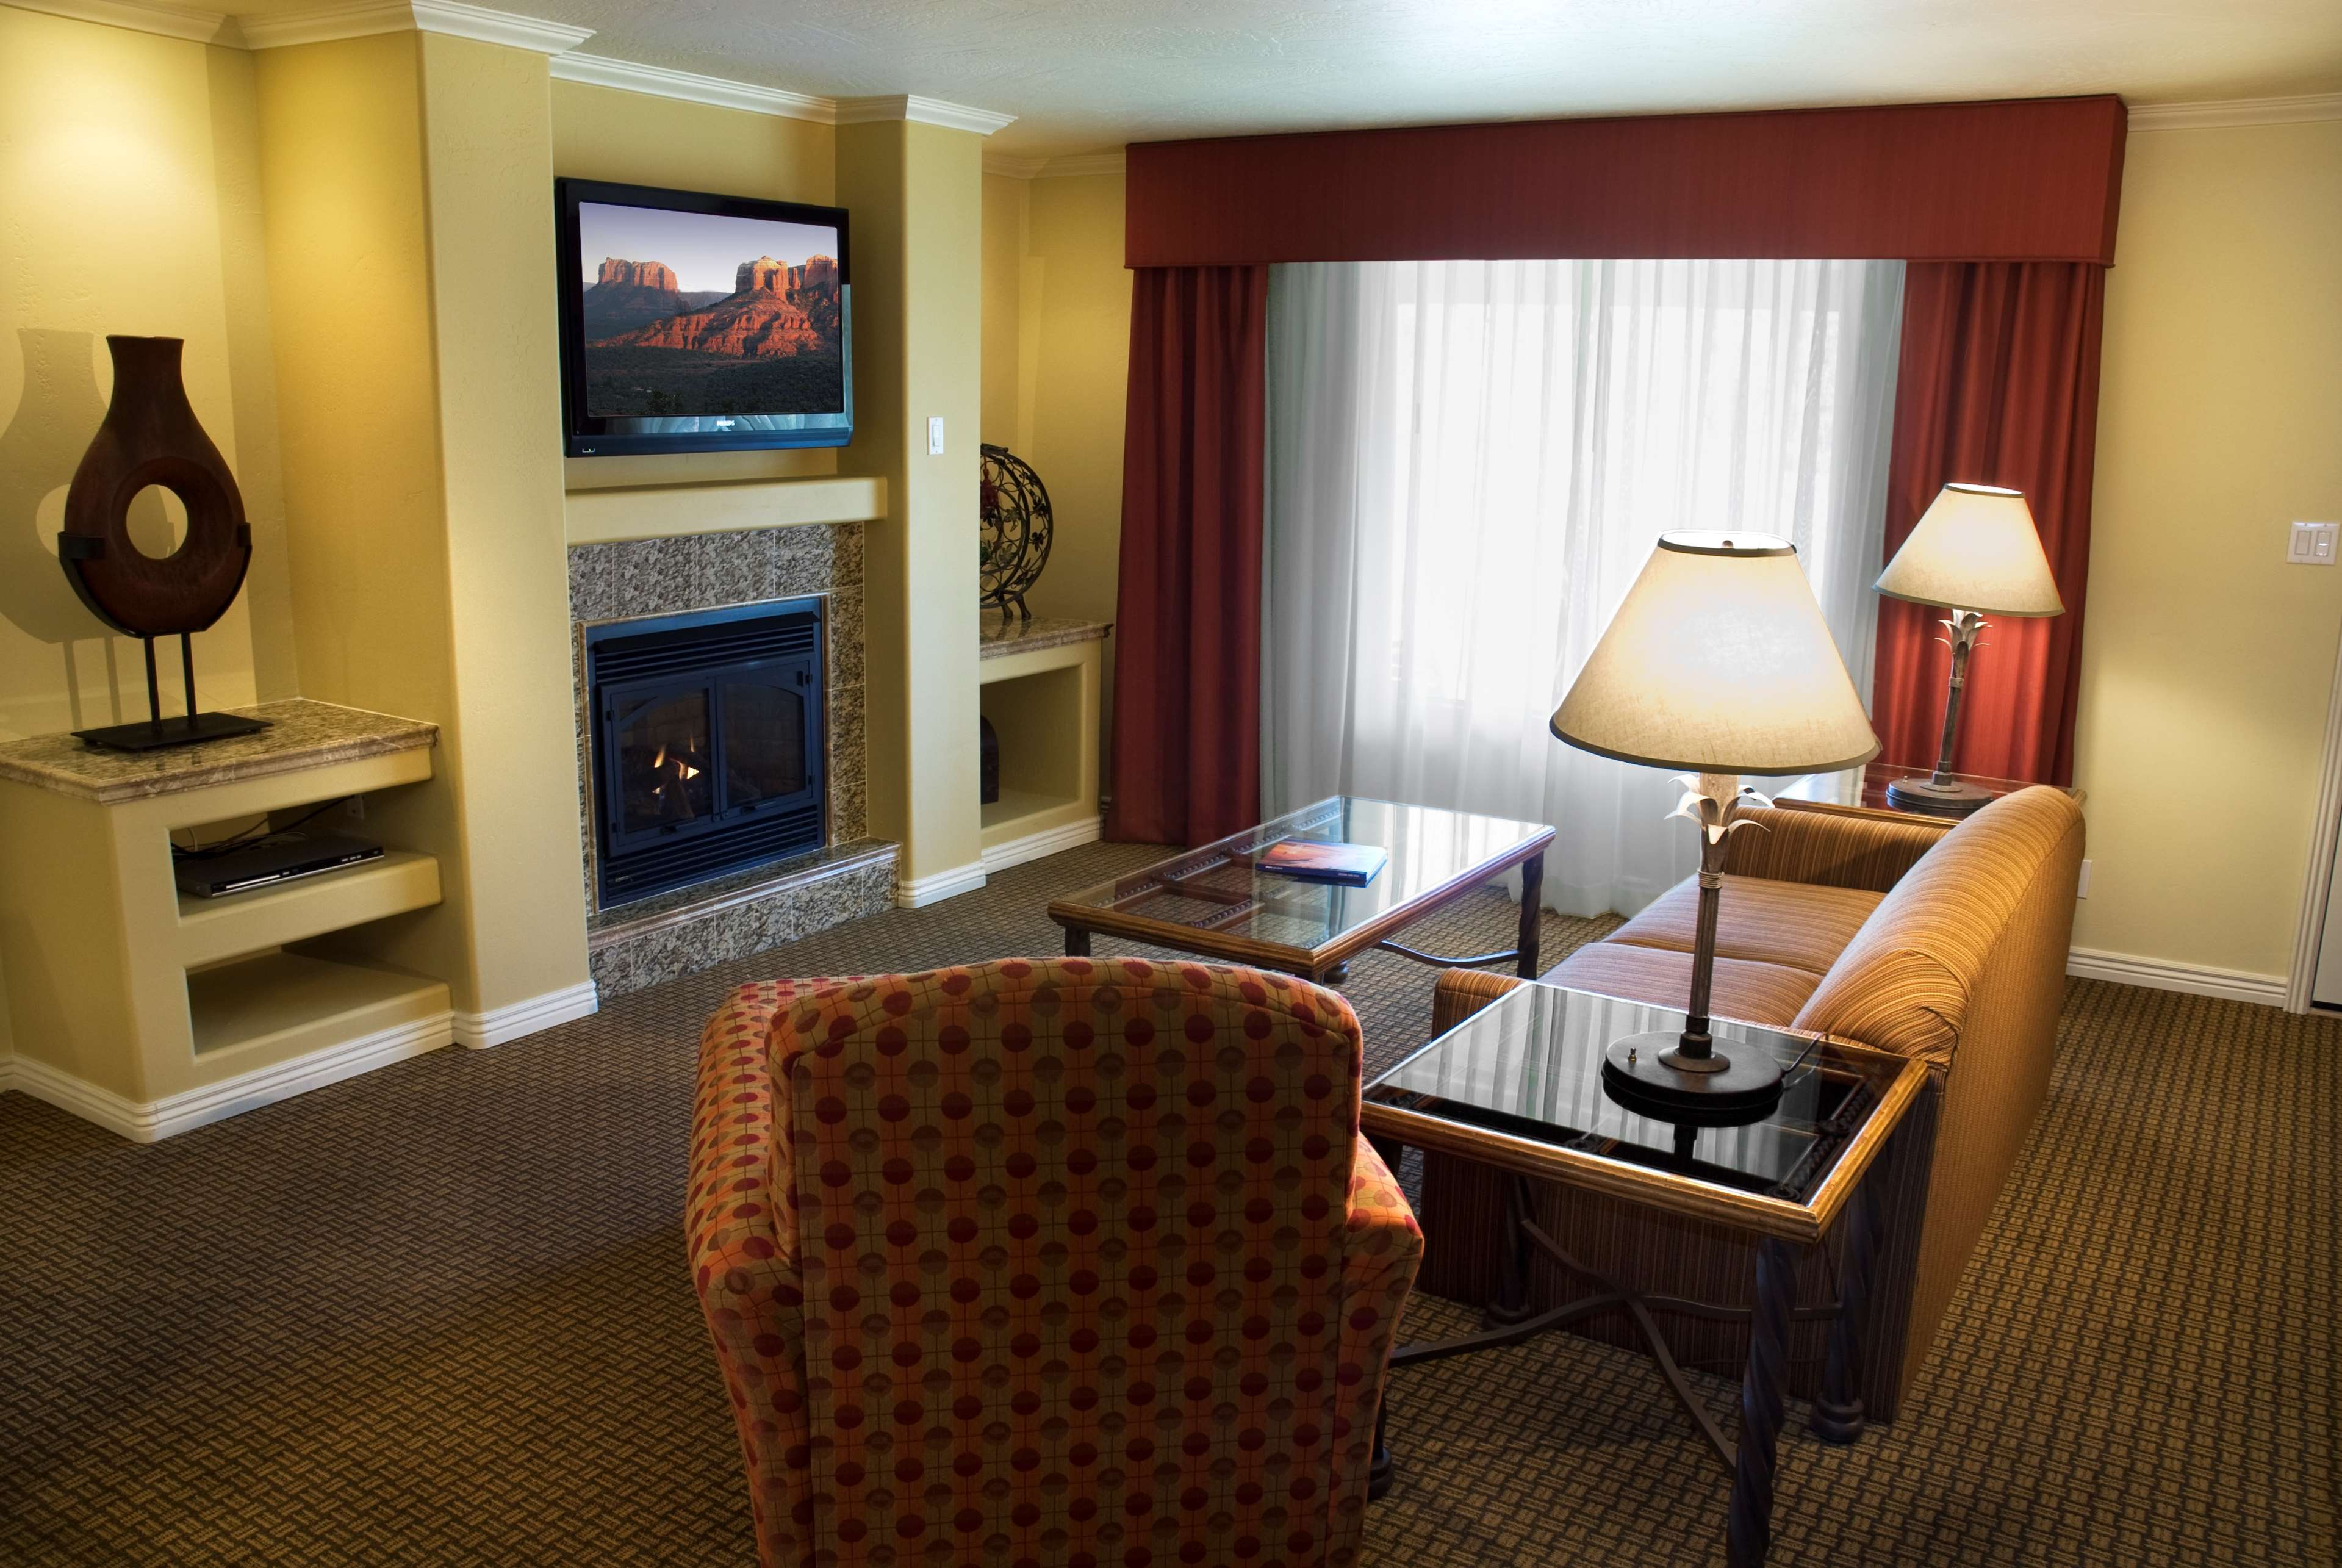 Best Western Plus Arroyo Roble Hotel & Creekside Villas image 35